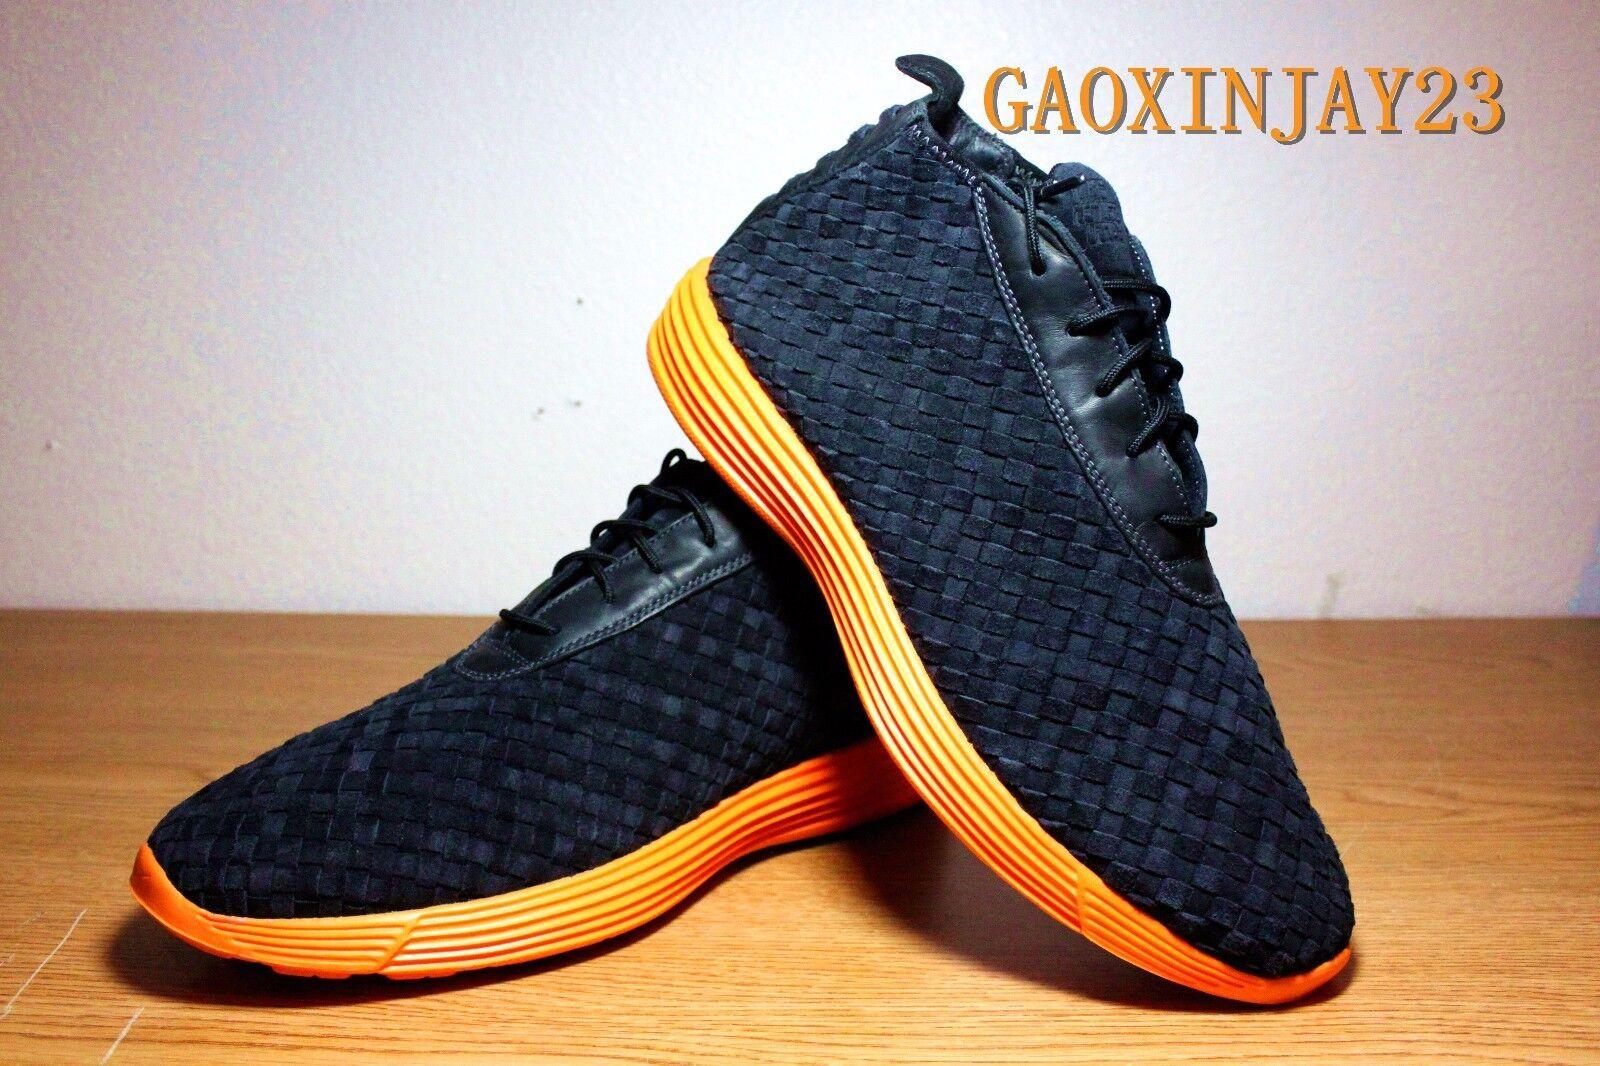 2010 Nike Nike Lunar Woven Chukka  Holland  Neatherlands Sample Rare PE  Sz 11